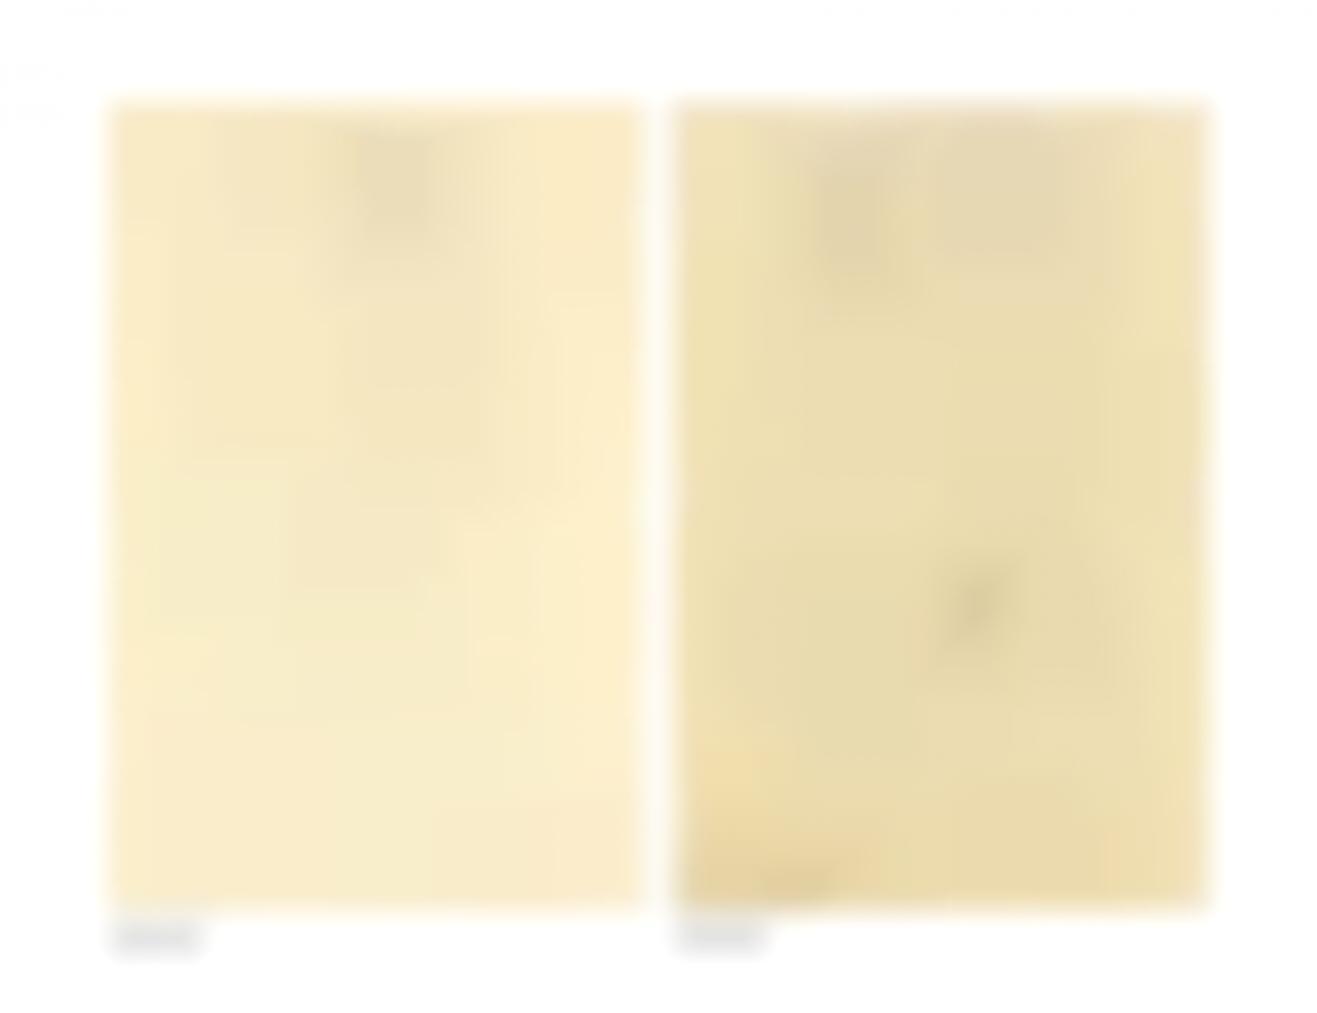 Gustav Klimt-Mit Hangendem Rechten Arm Und Waagrechtem Linken (Recto And Verso)-1907